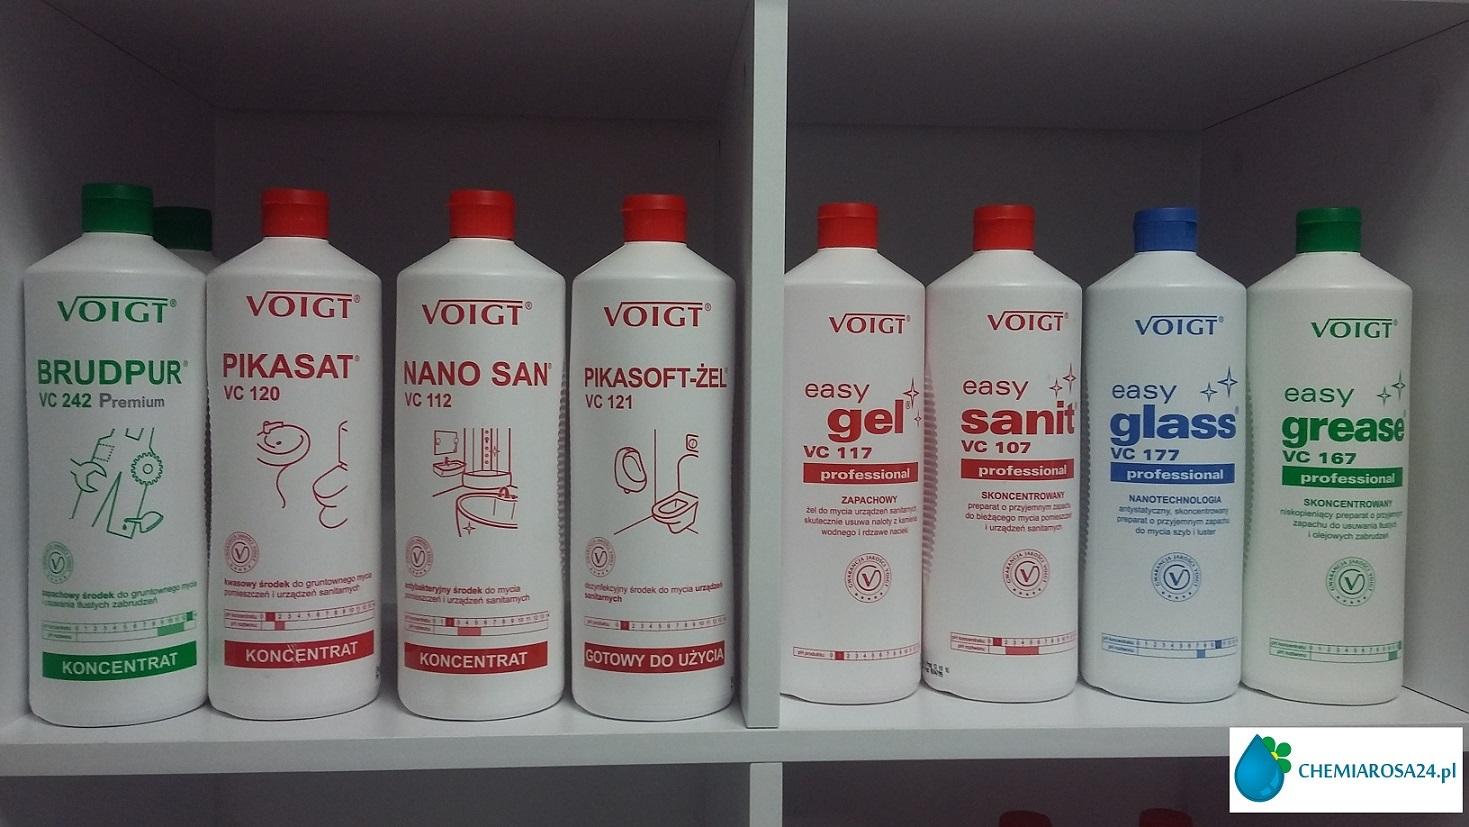 Chemia profesjonalna Voigt chemiarosa24.pl